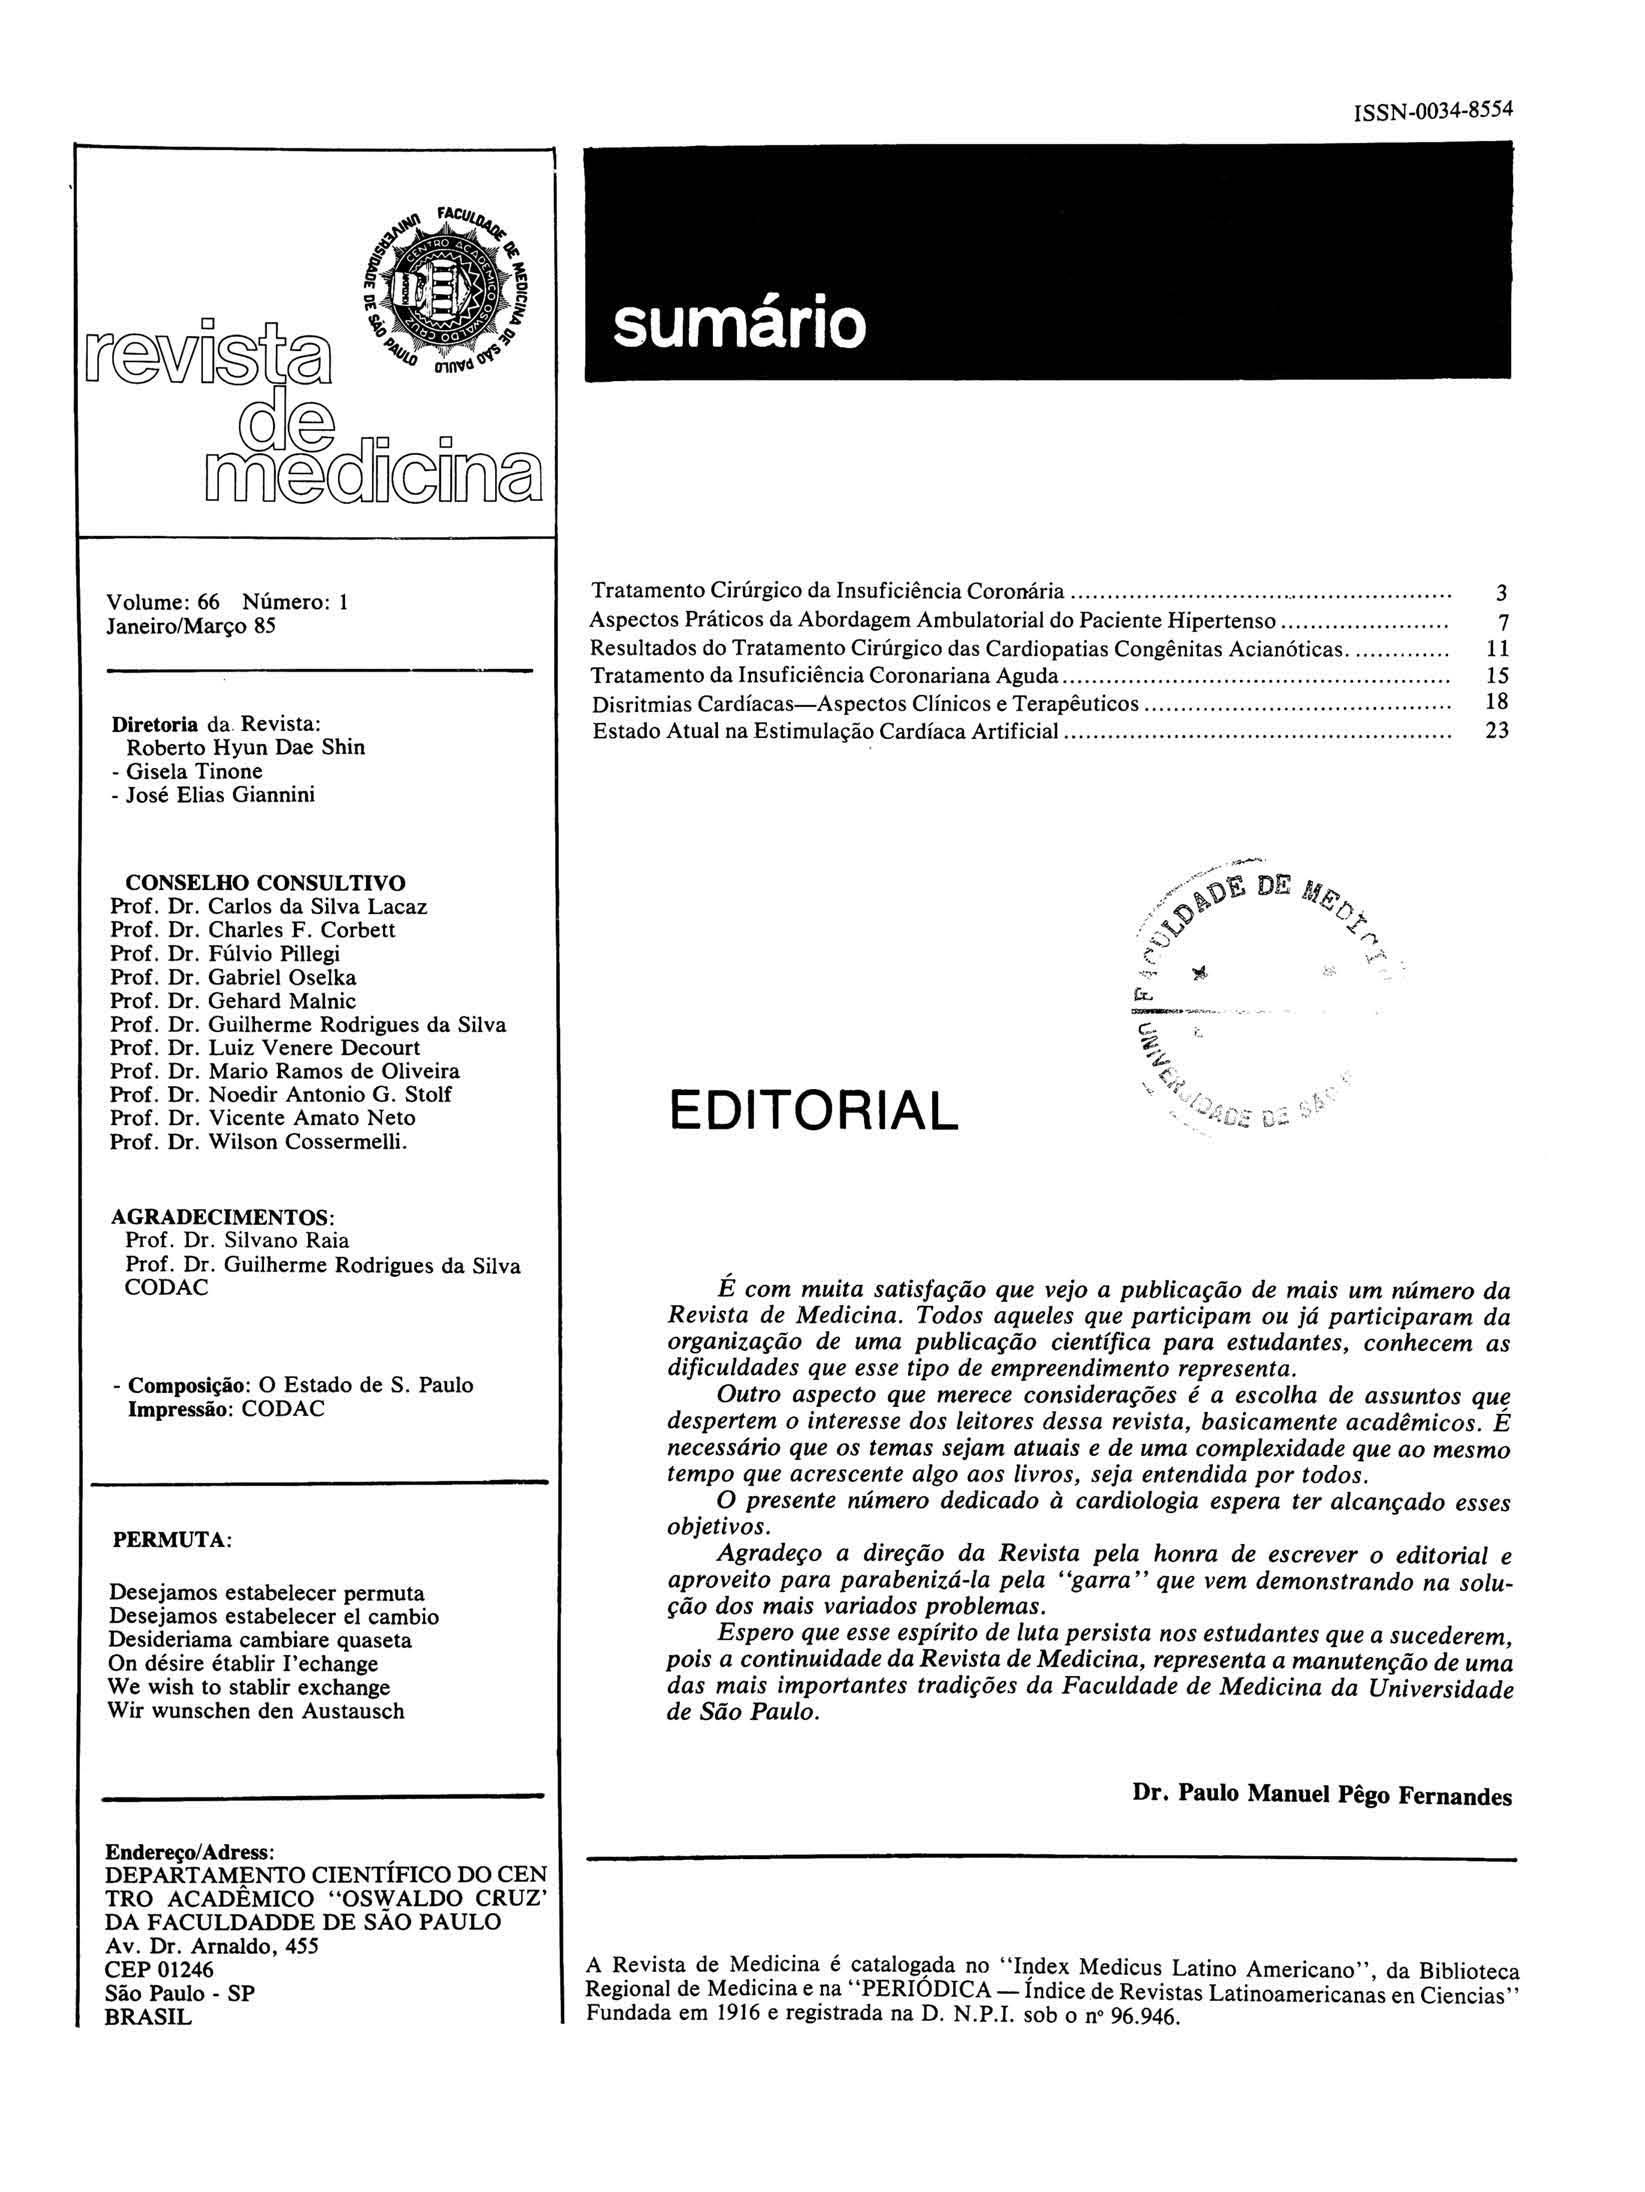 Visualizar v. 66 n. 1 (1985)